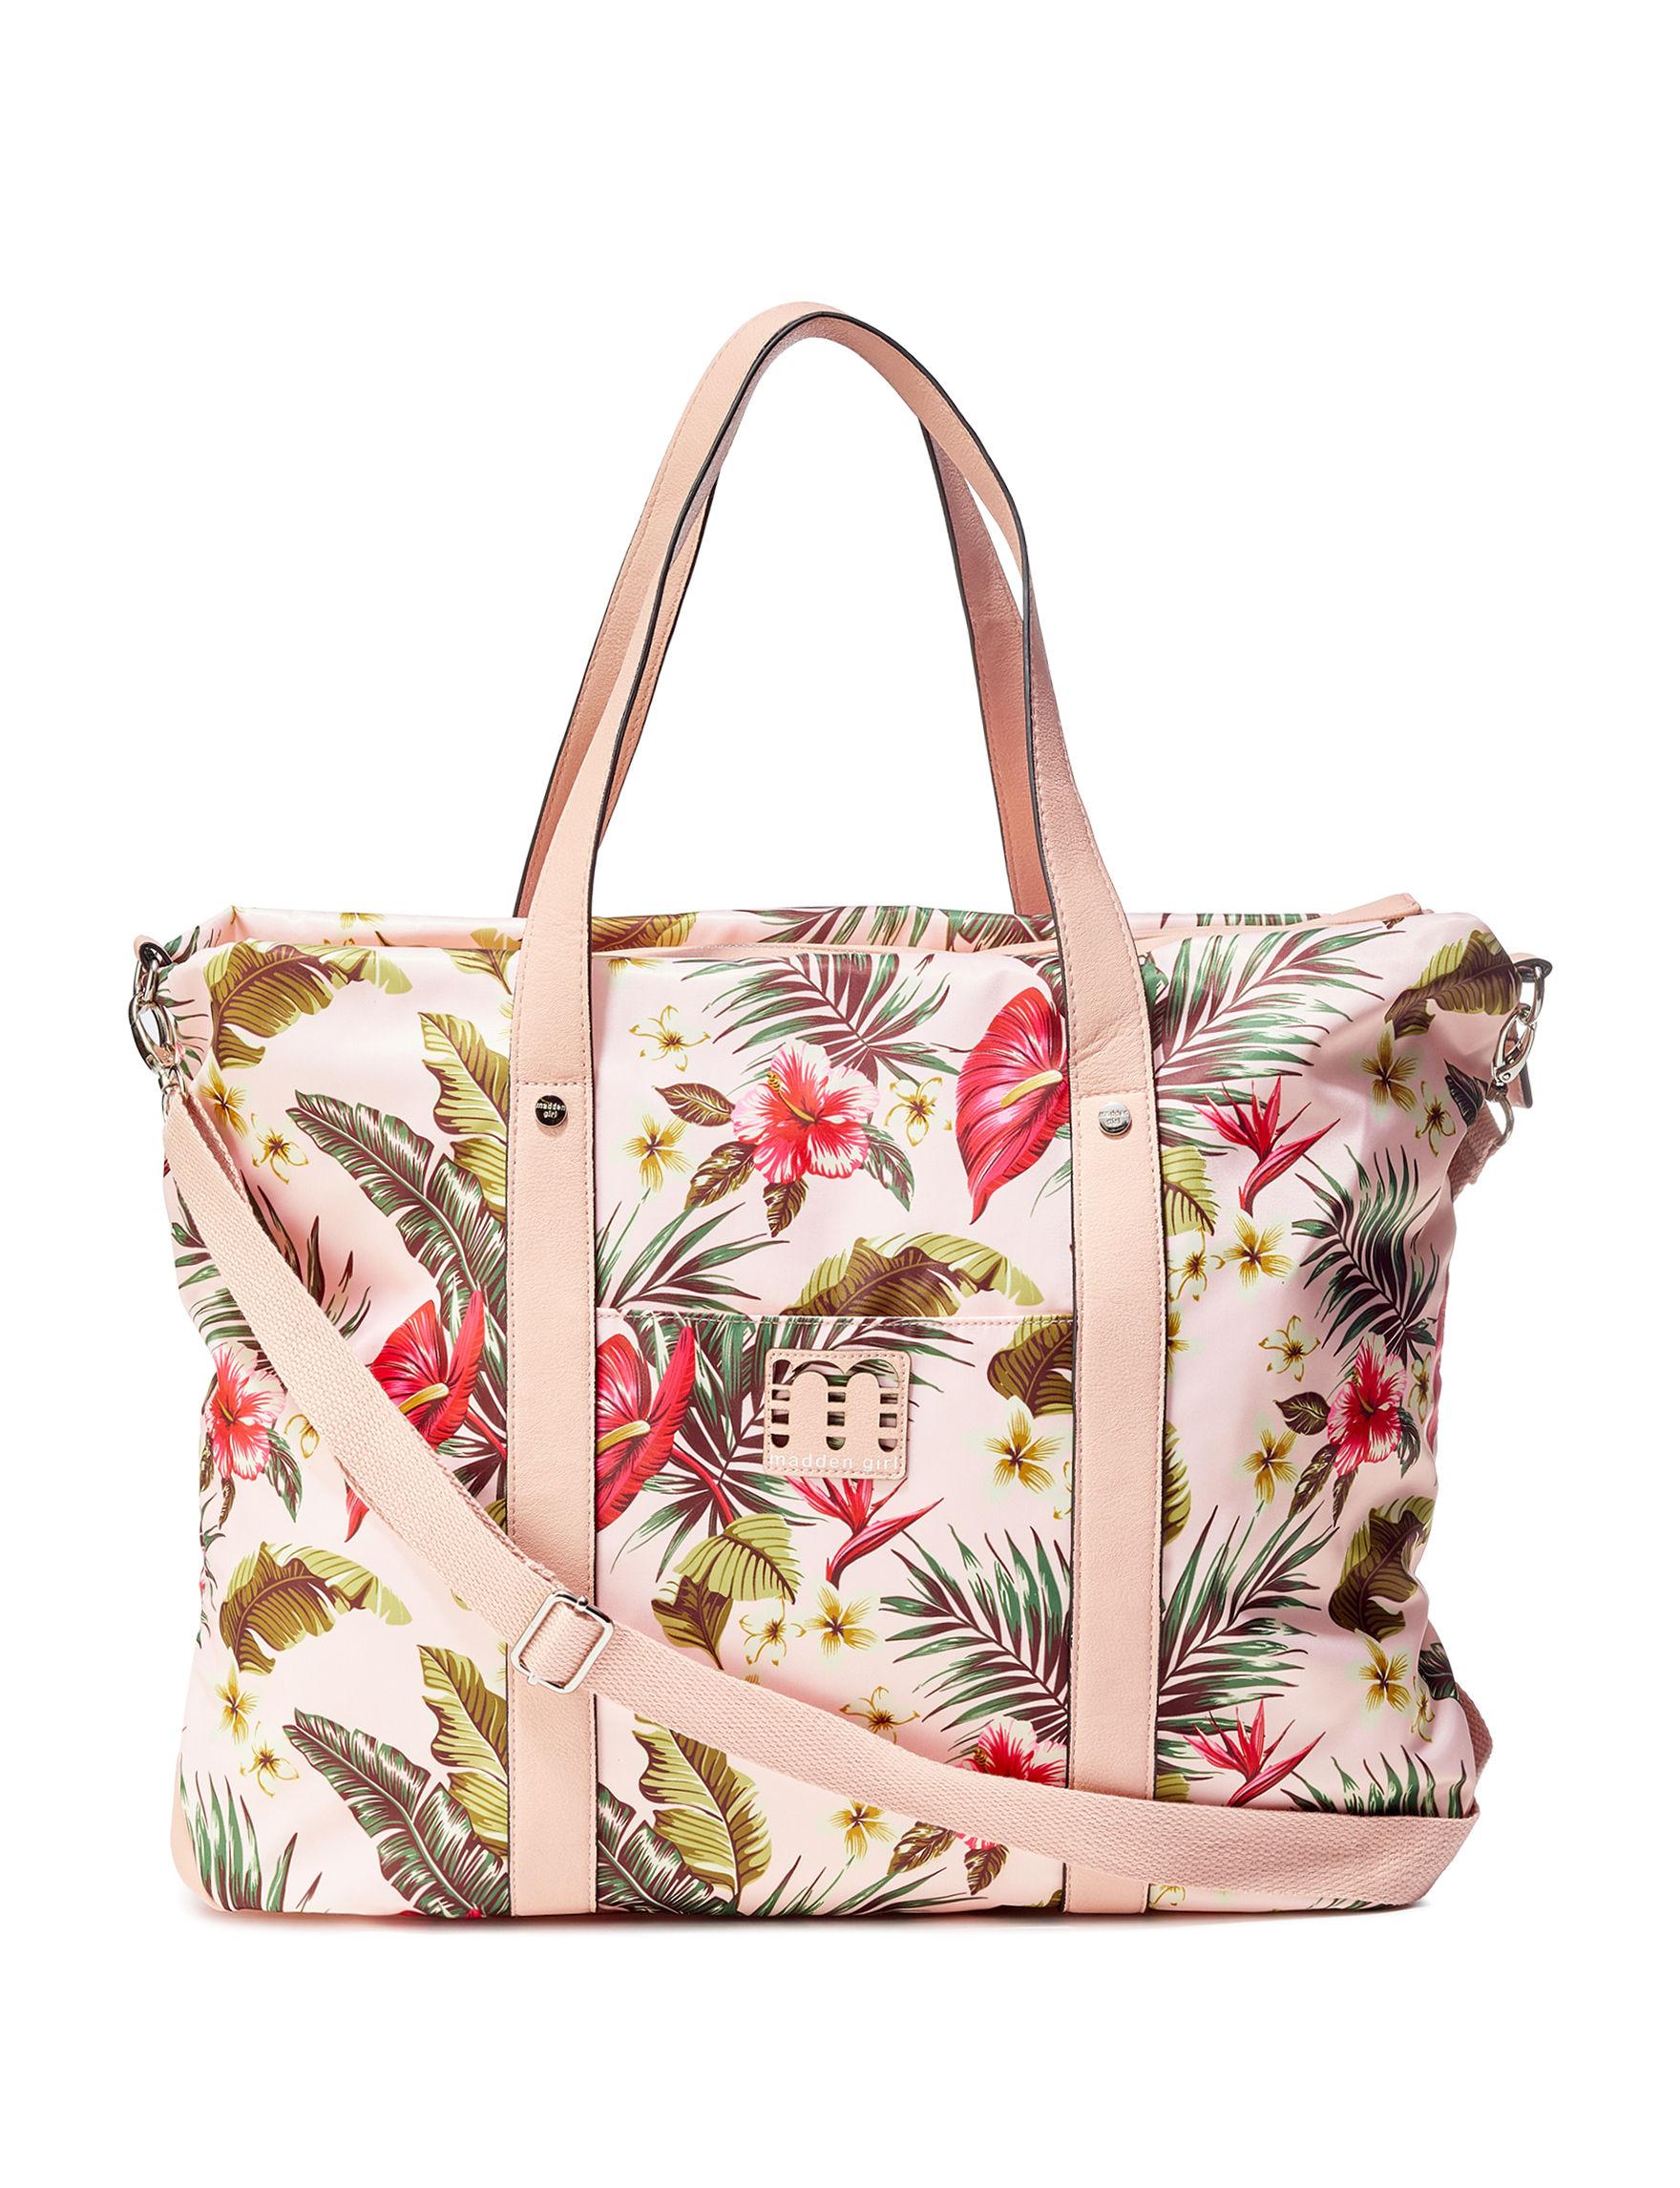 Madden Girl Pink / Multi Weekend Bags